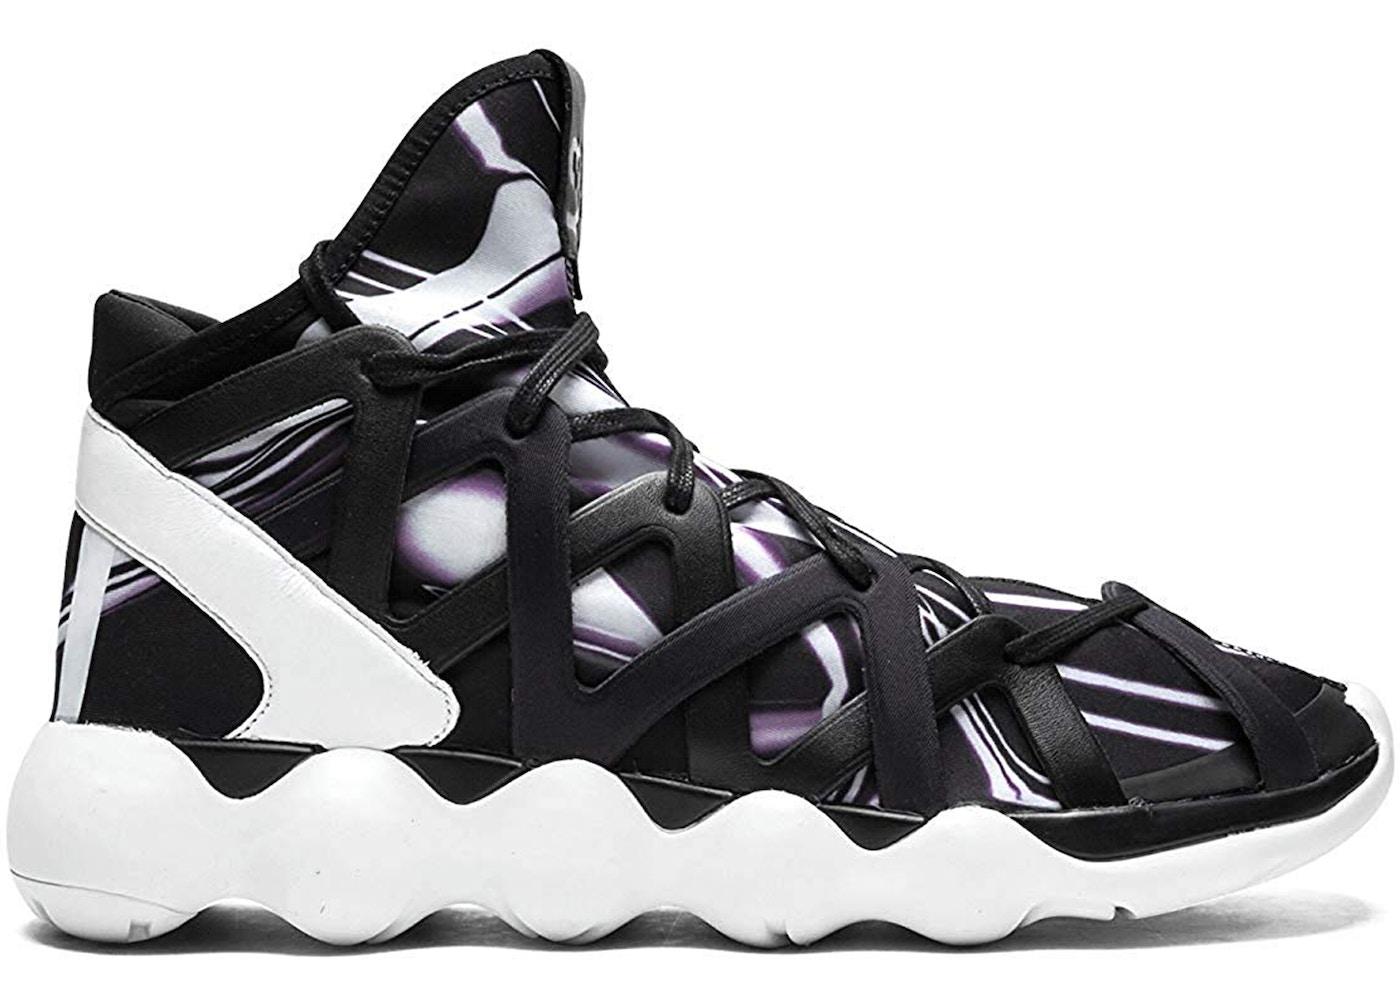 bdcae2f90 Sell. or Ask. Size 9. View All Bids. adidas Y-3 Kyujo High Black Purple  White